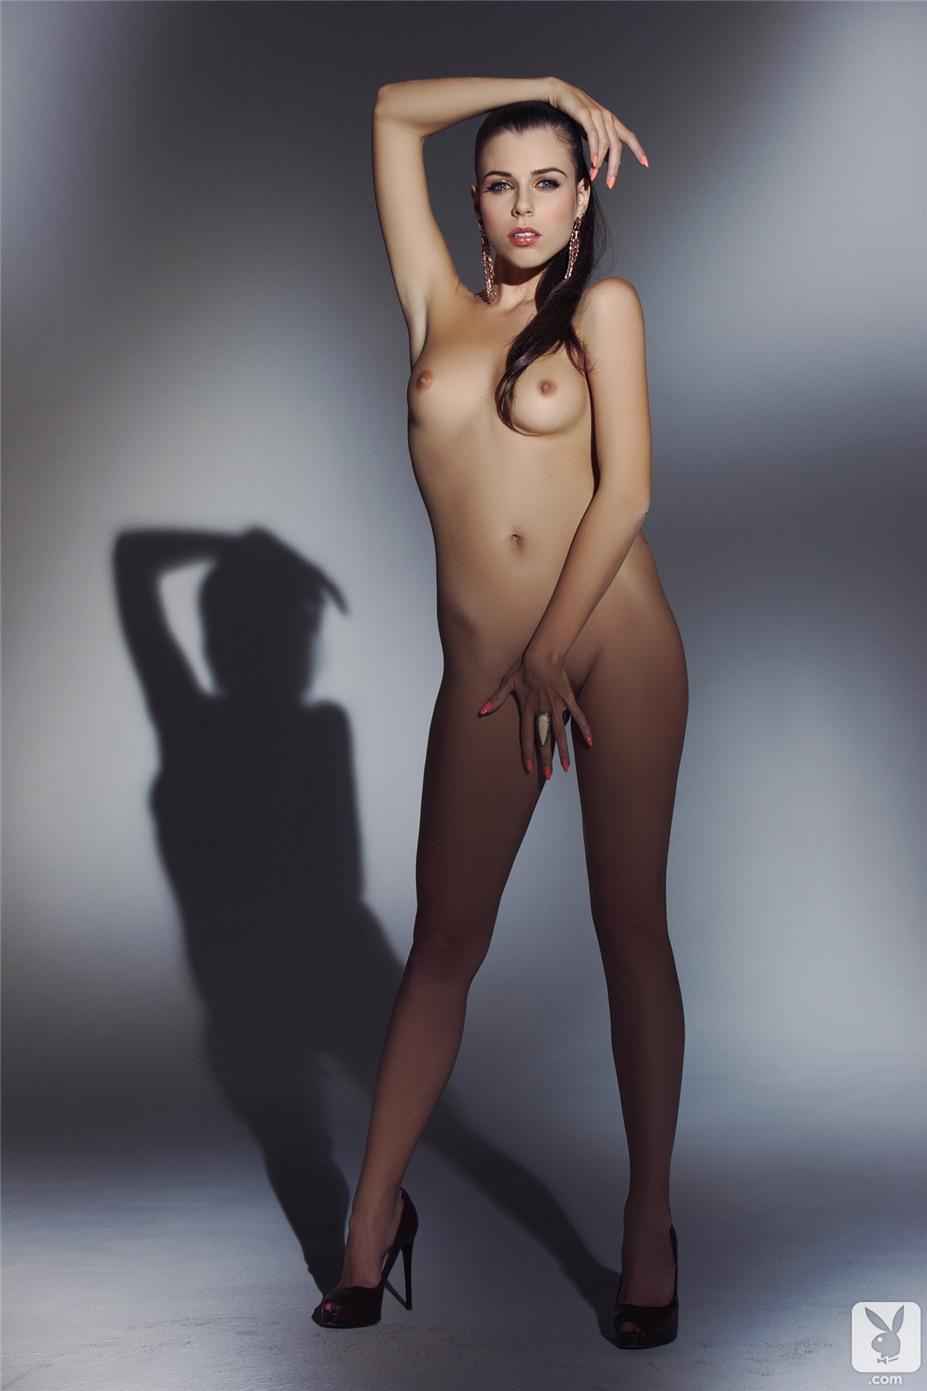 Алекса Слюсарччи / Aleksa Slusarchi as Sensual Motion for Playboy Plus